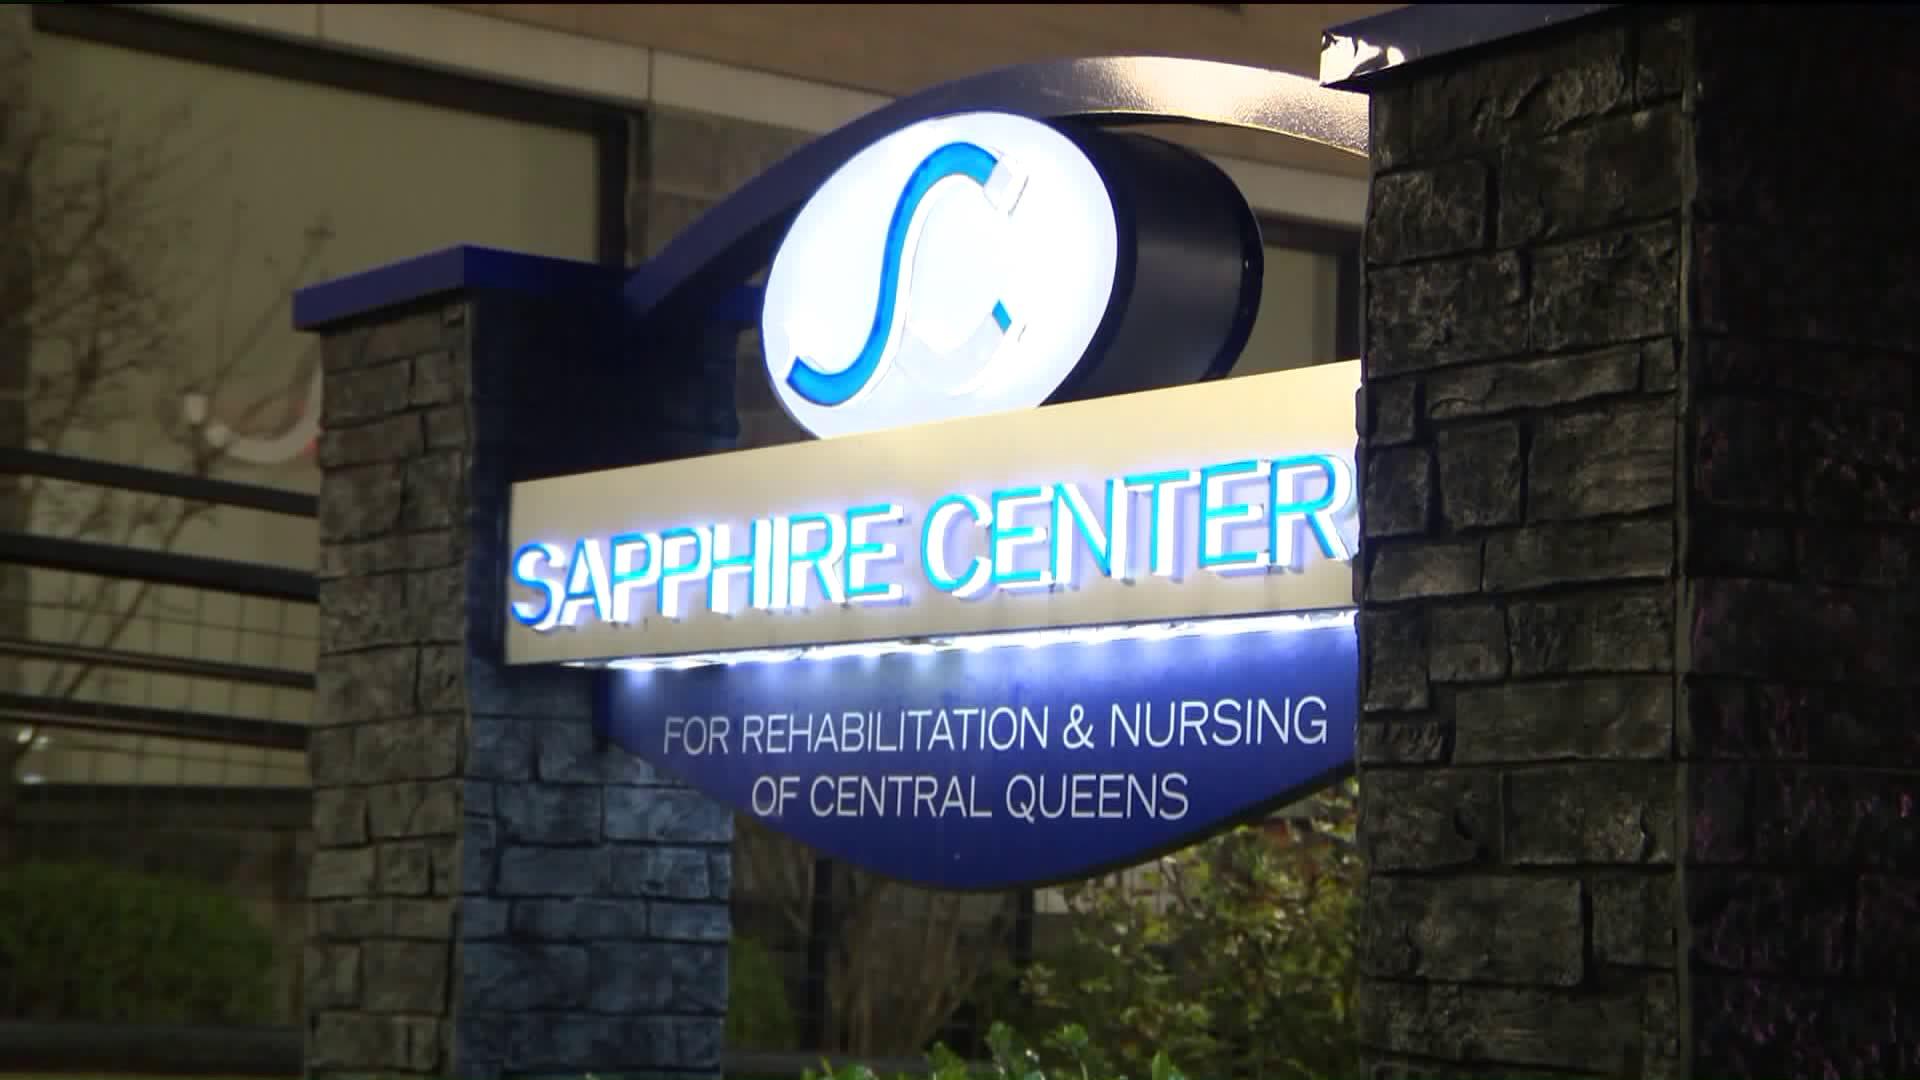 Sapphire Center nursing home in Queens